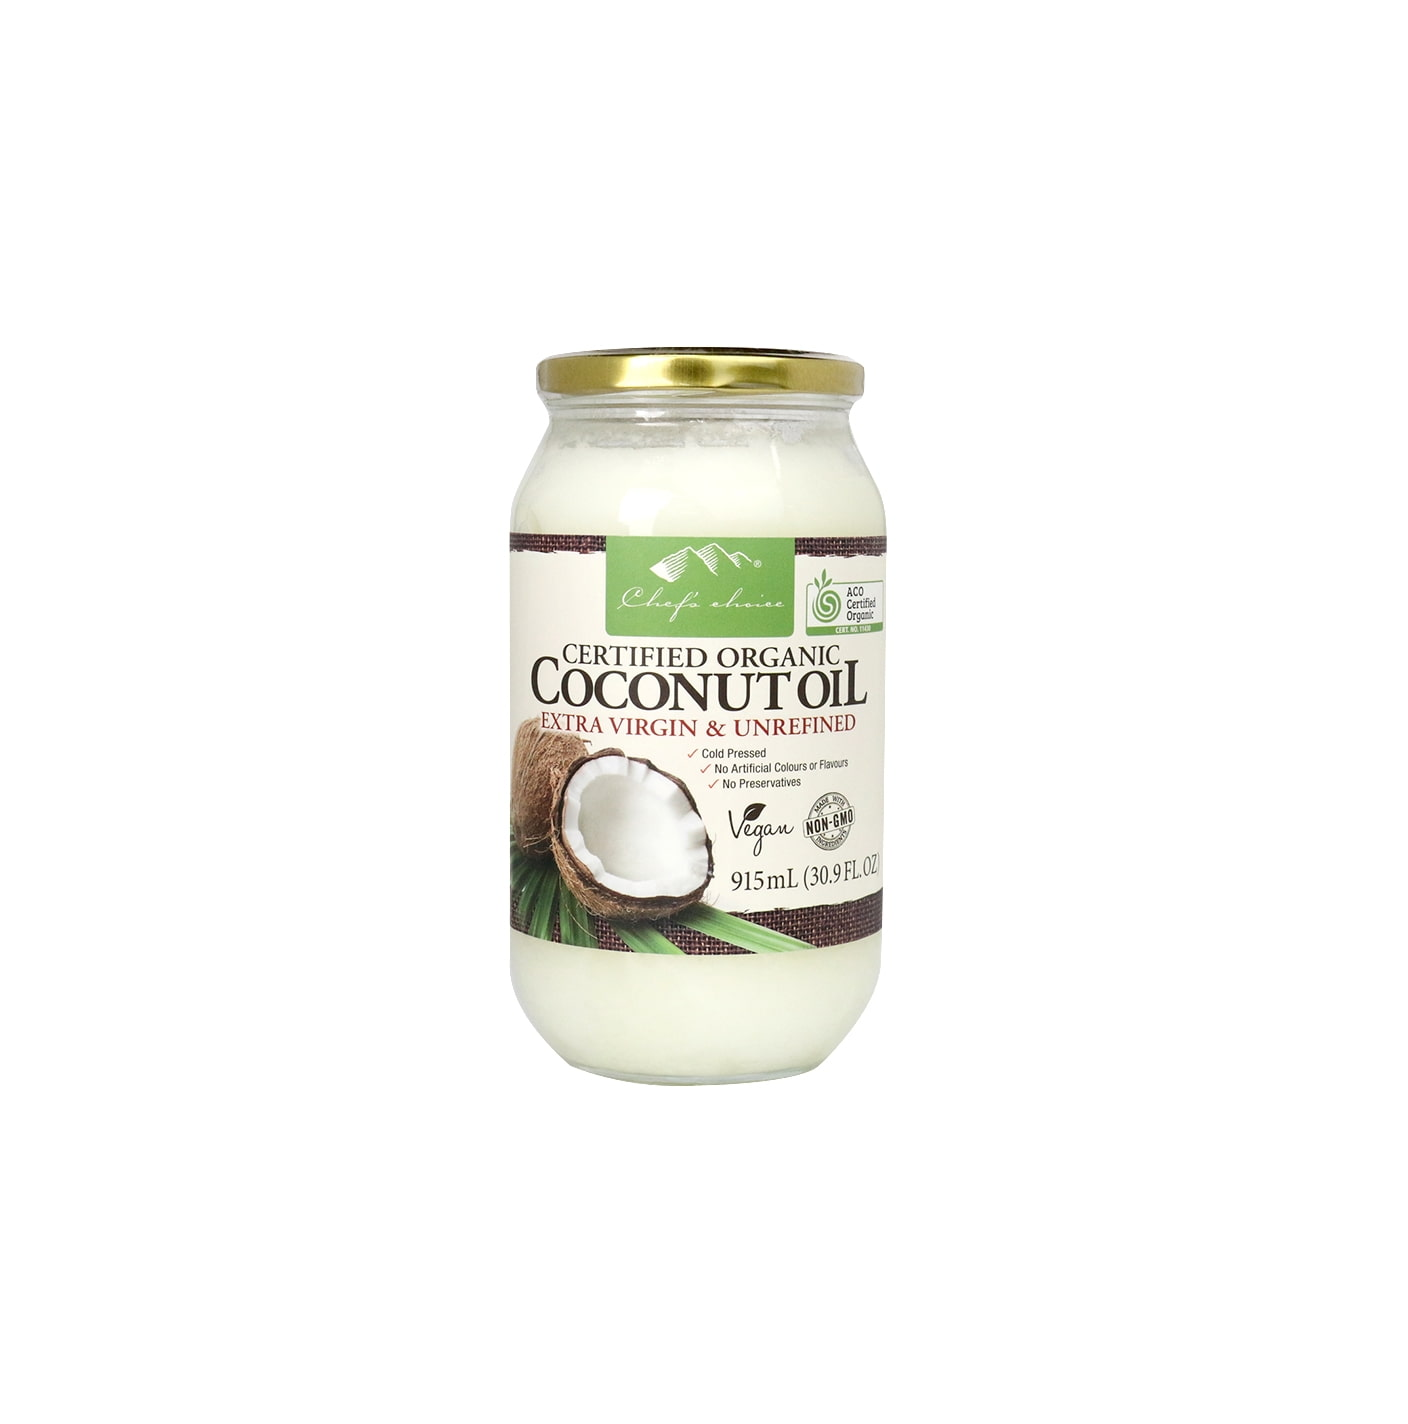 Org Coconut Oil Extra Virgin & Unrefined 915mL